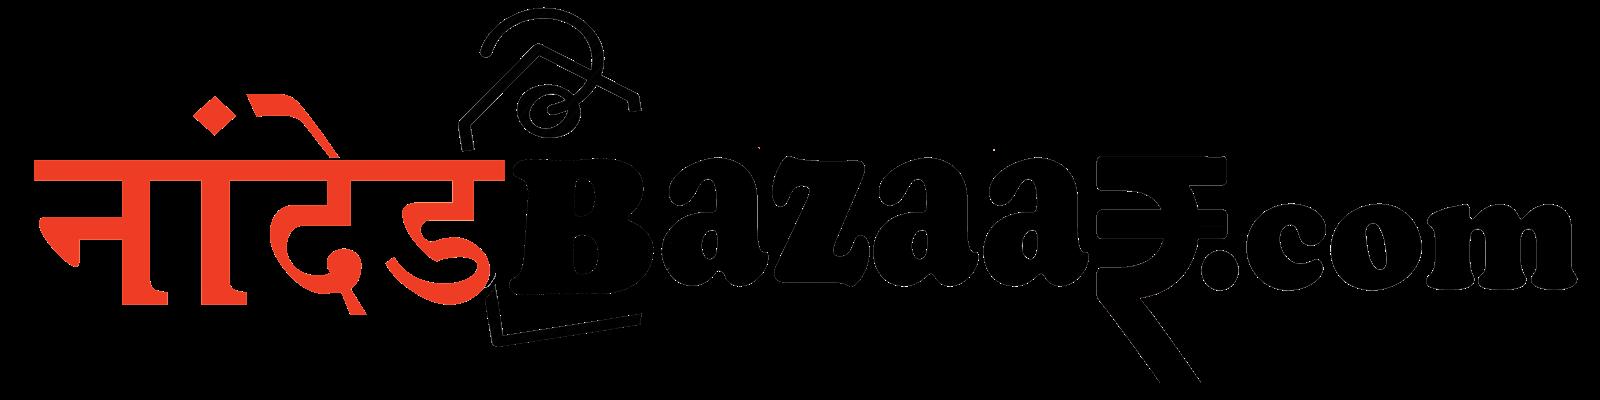 NandedBazaar.com